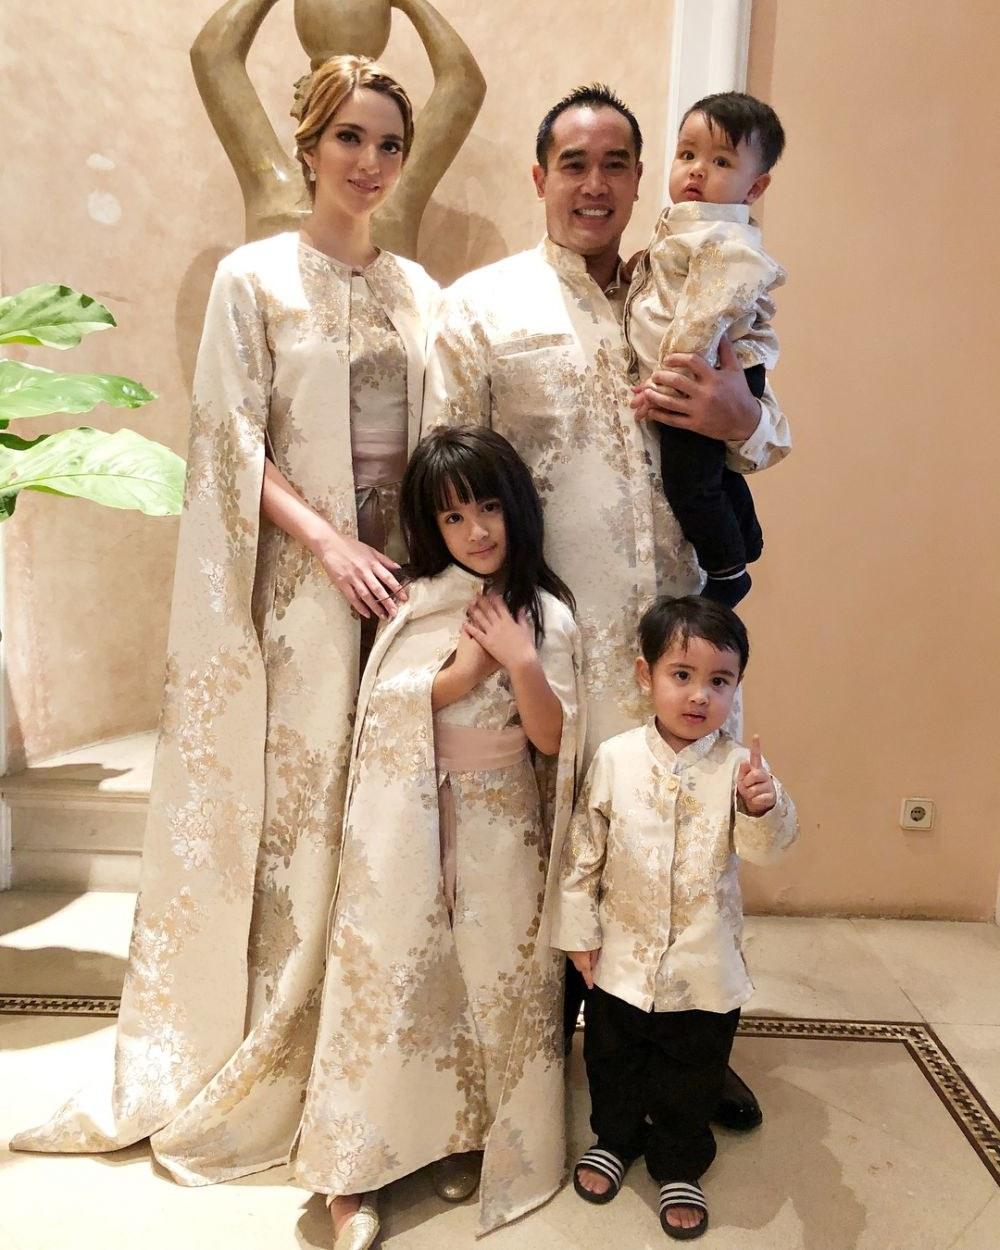 Ide Baju Lebaran Keluarga Artis Rldj Potret 16 Seleb Pakai Baju Kembaran Saat Lebaran Kompak Abis